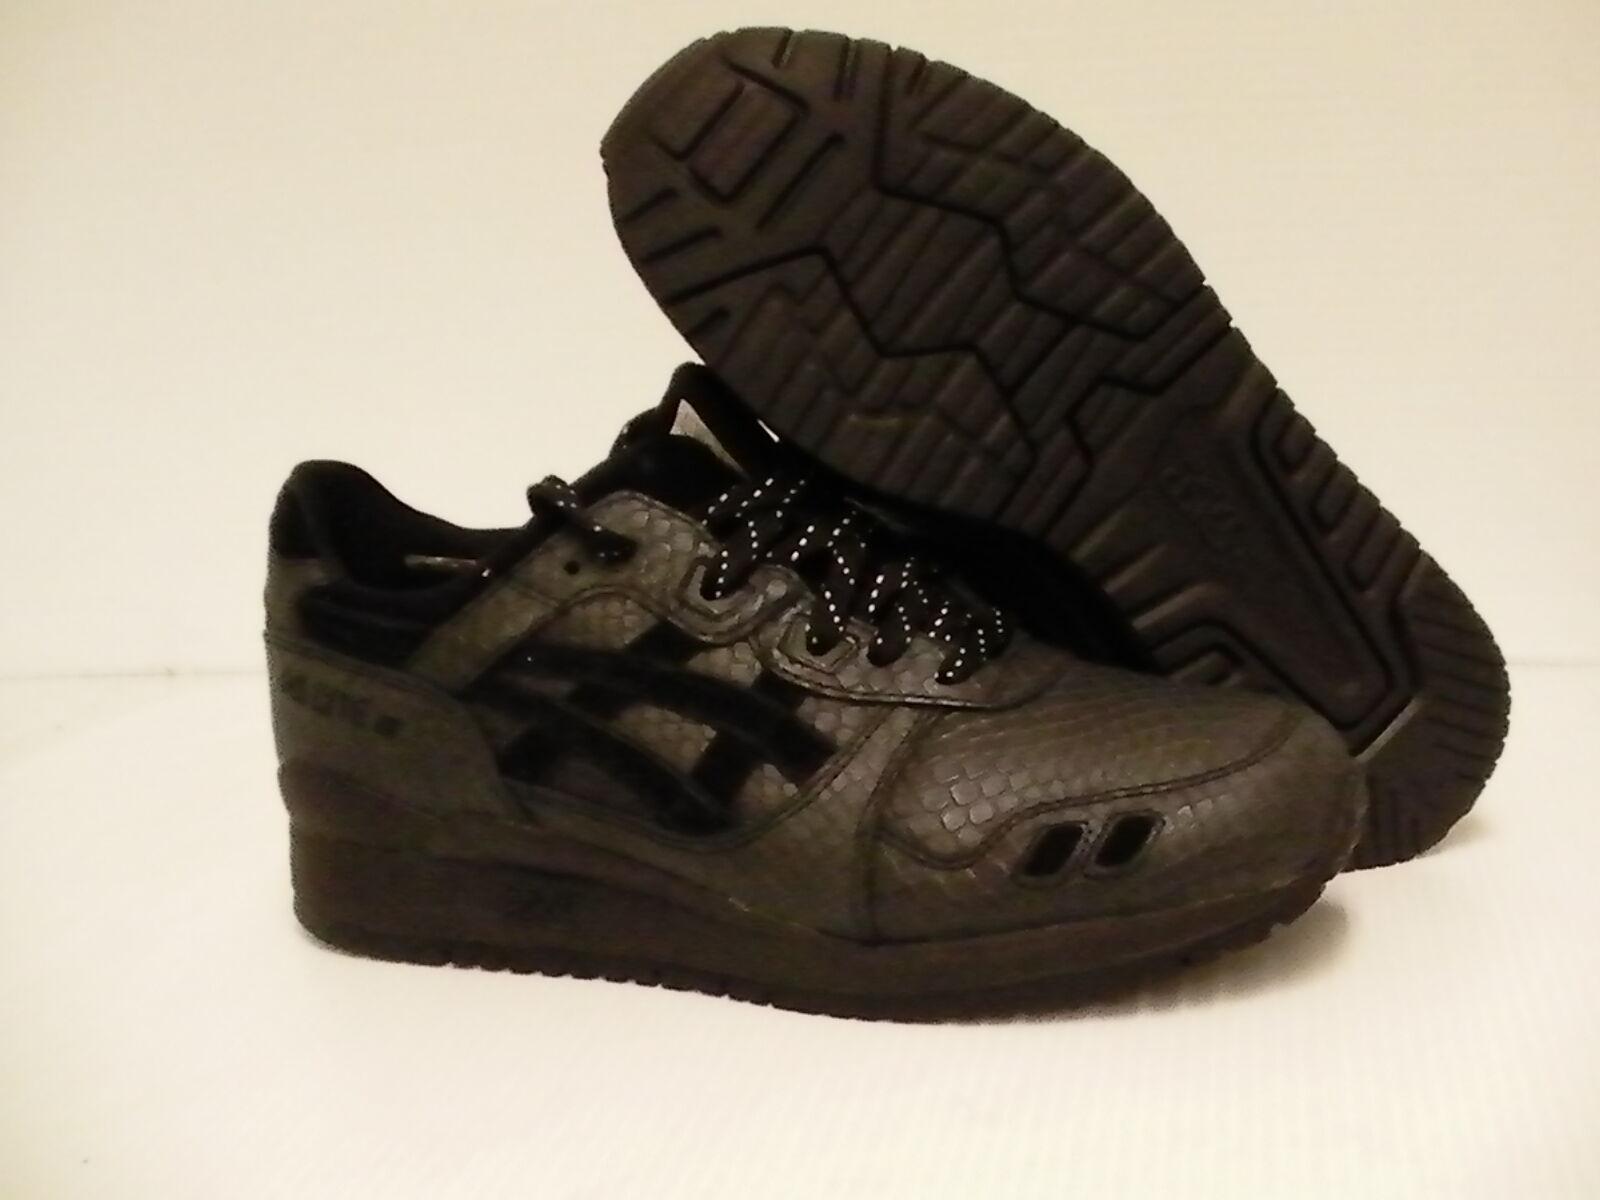 Chaussures Hommes En Cuir Asics RPlEcy